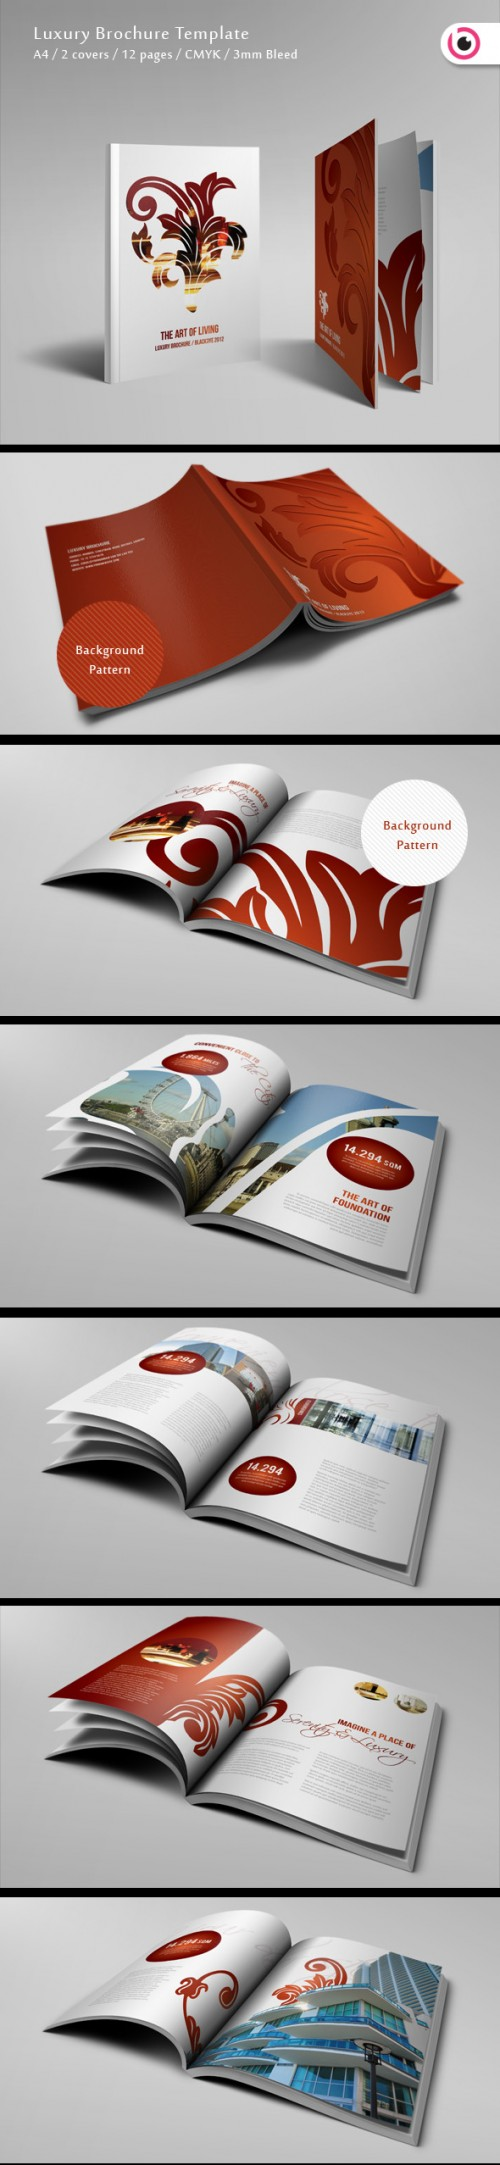 28_Luxury Brochure Template